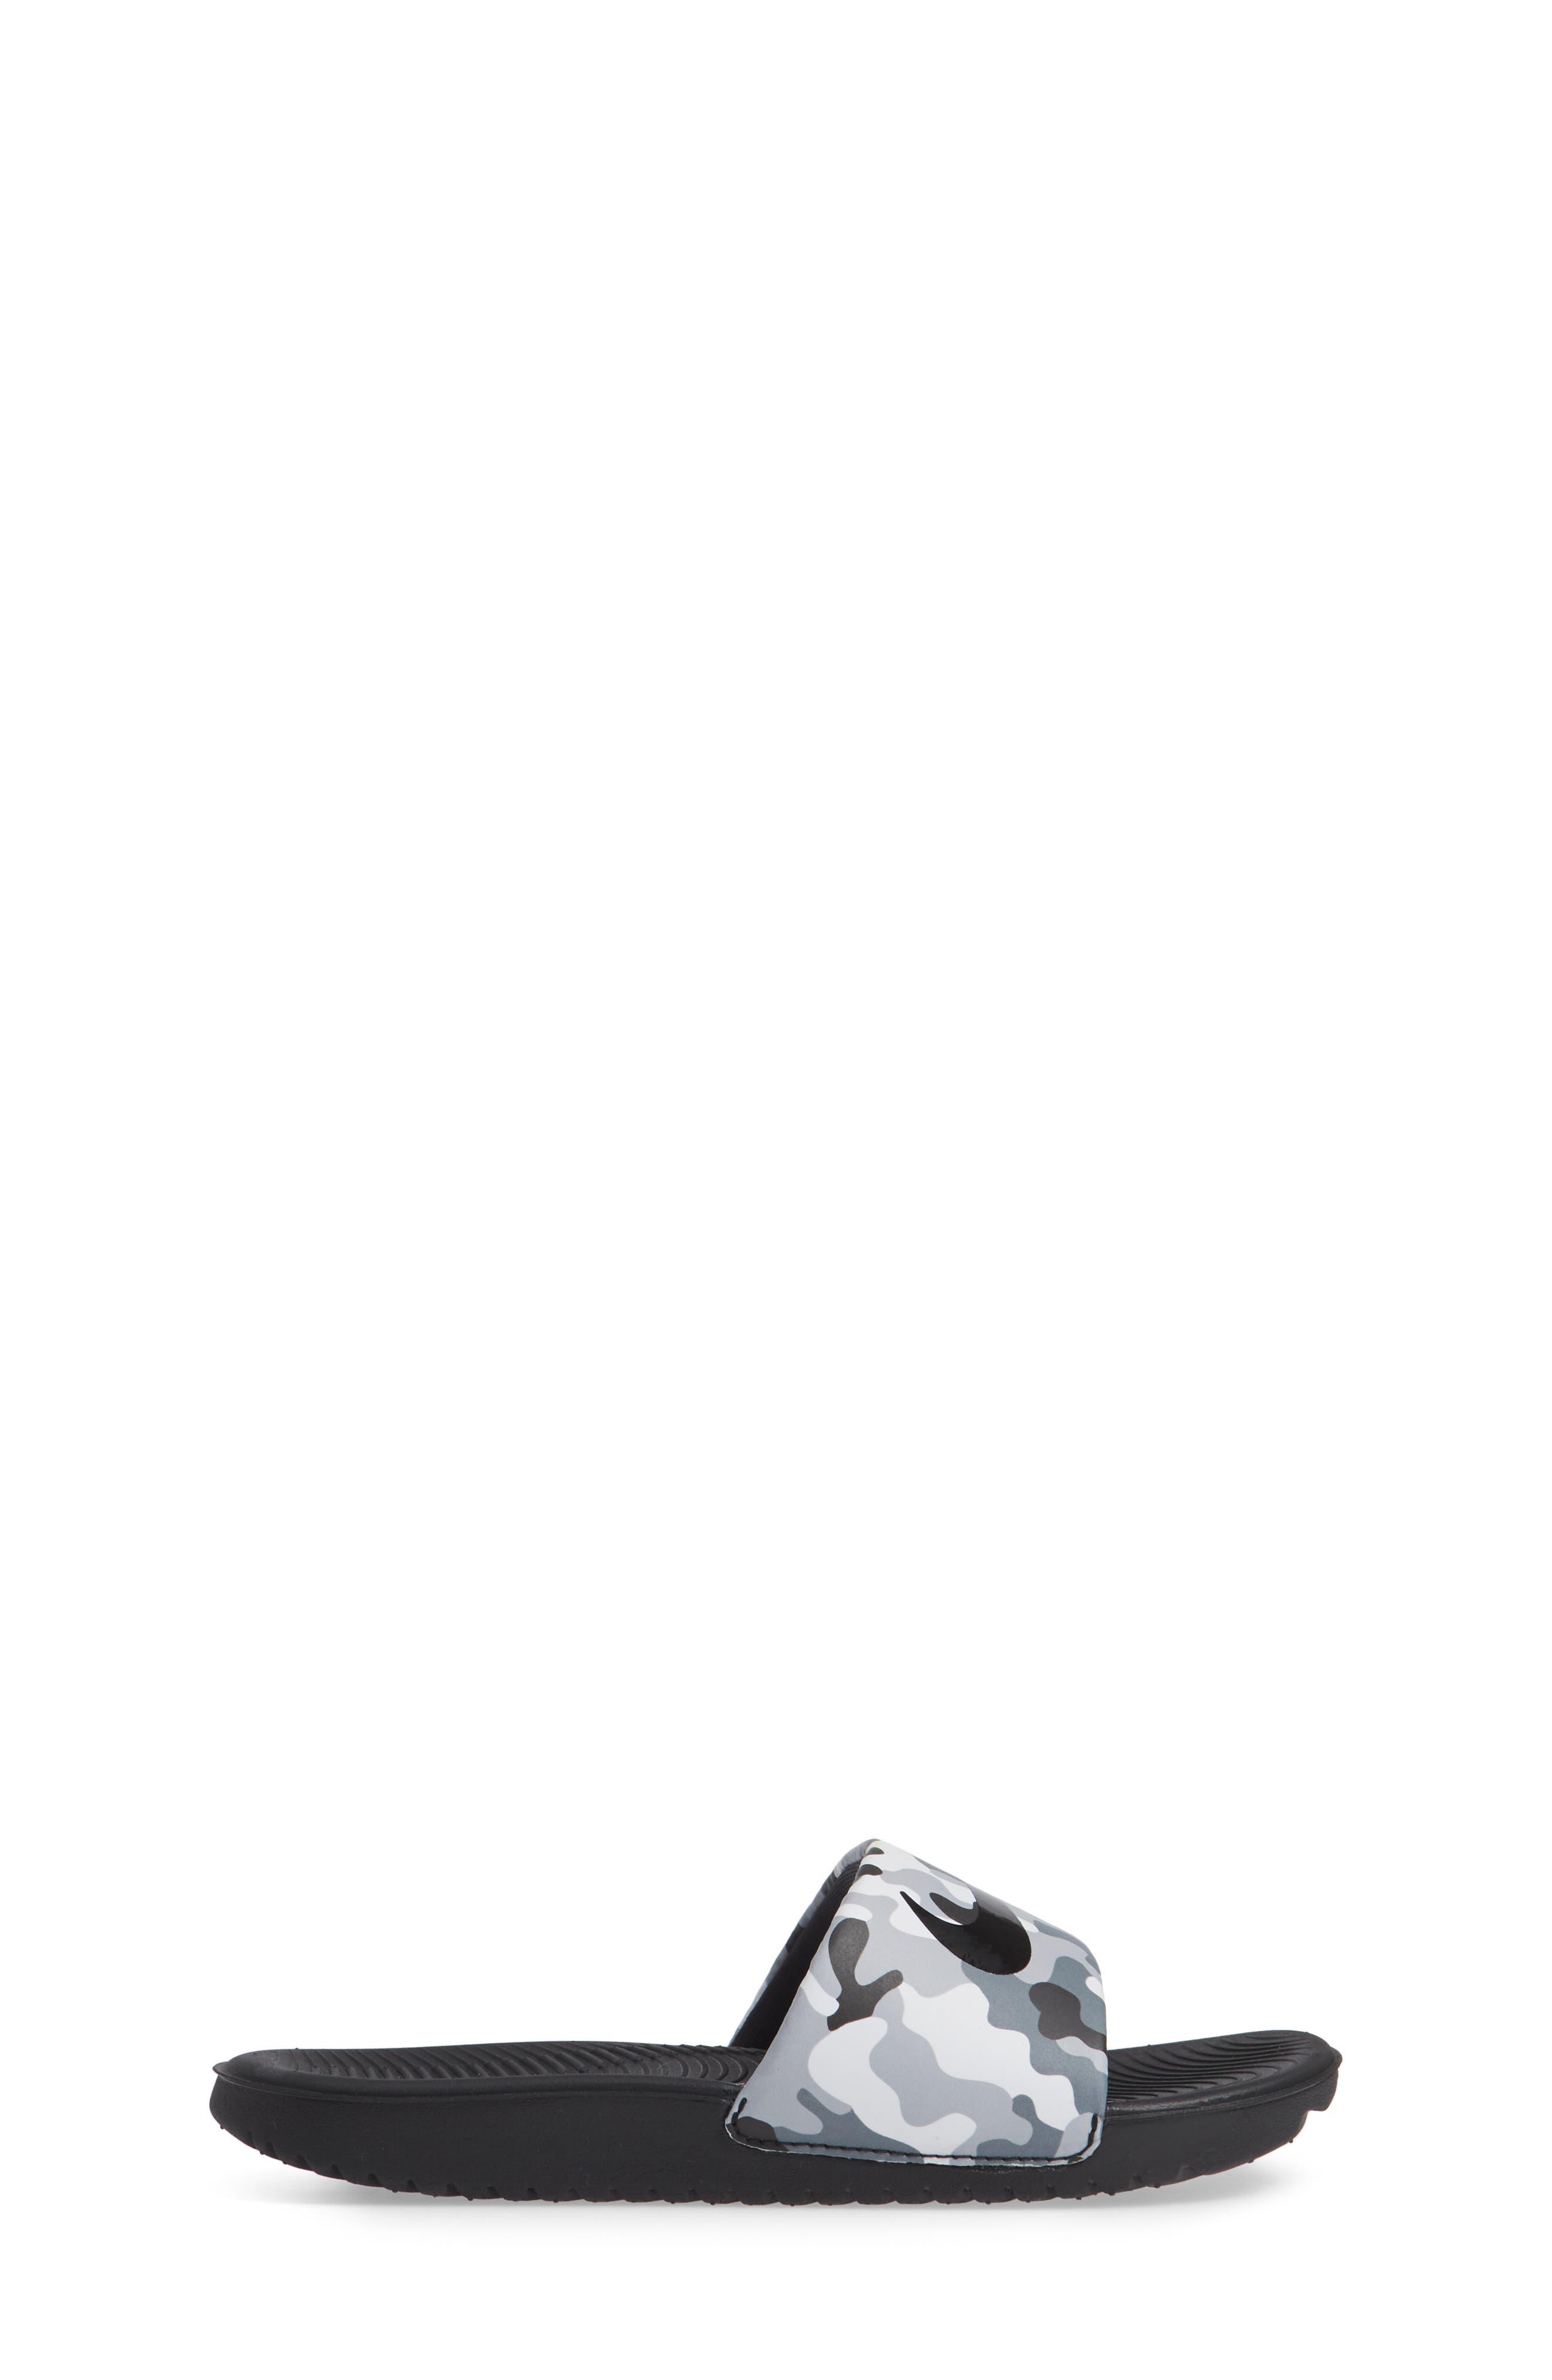 NIKE, Kawa Slide Sandal, Alternate thumbnail 3, color, WOLF GREY/ BLACK/ WHITE